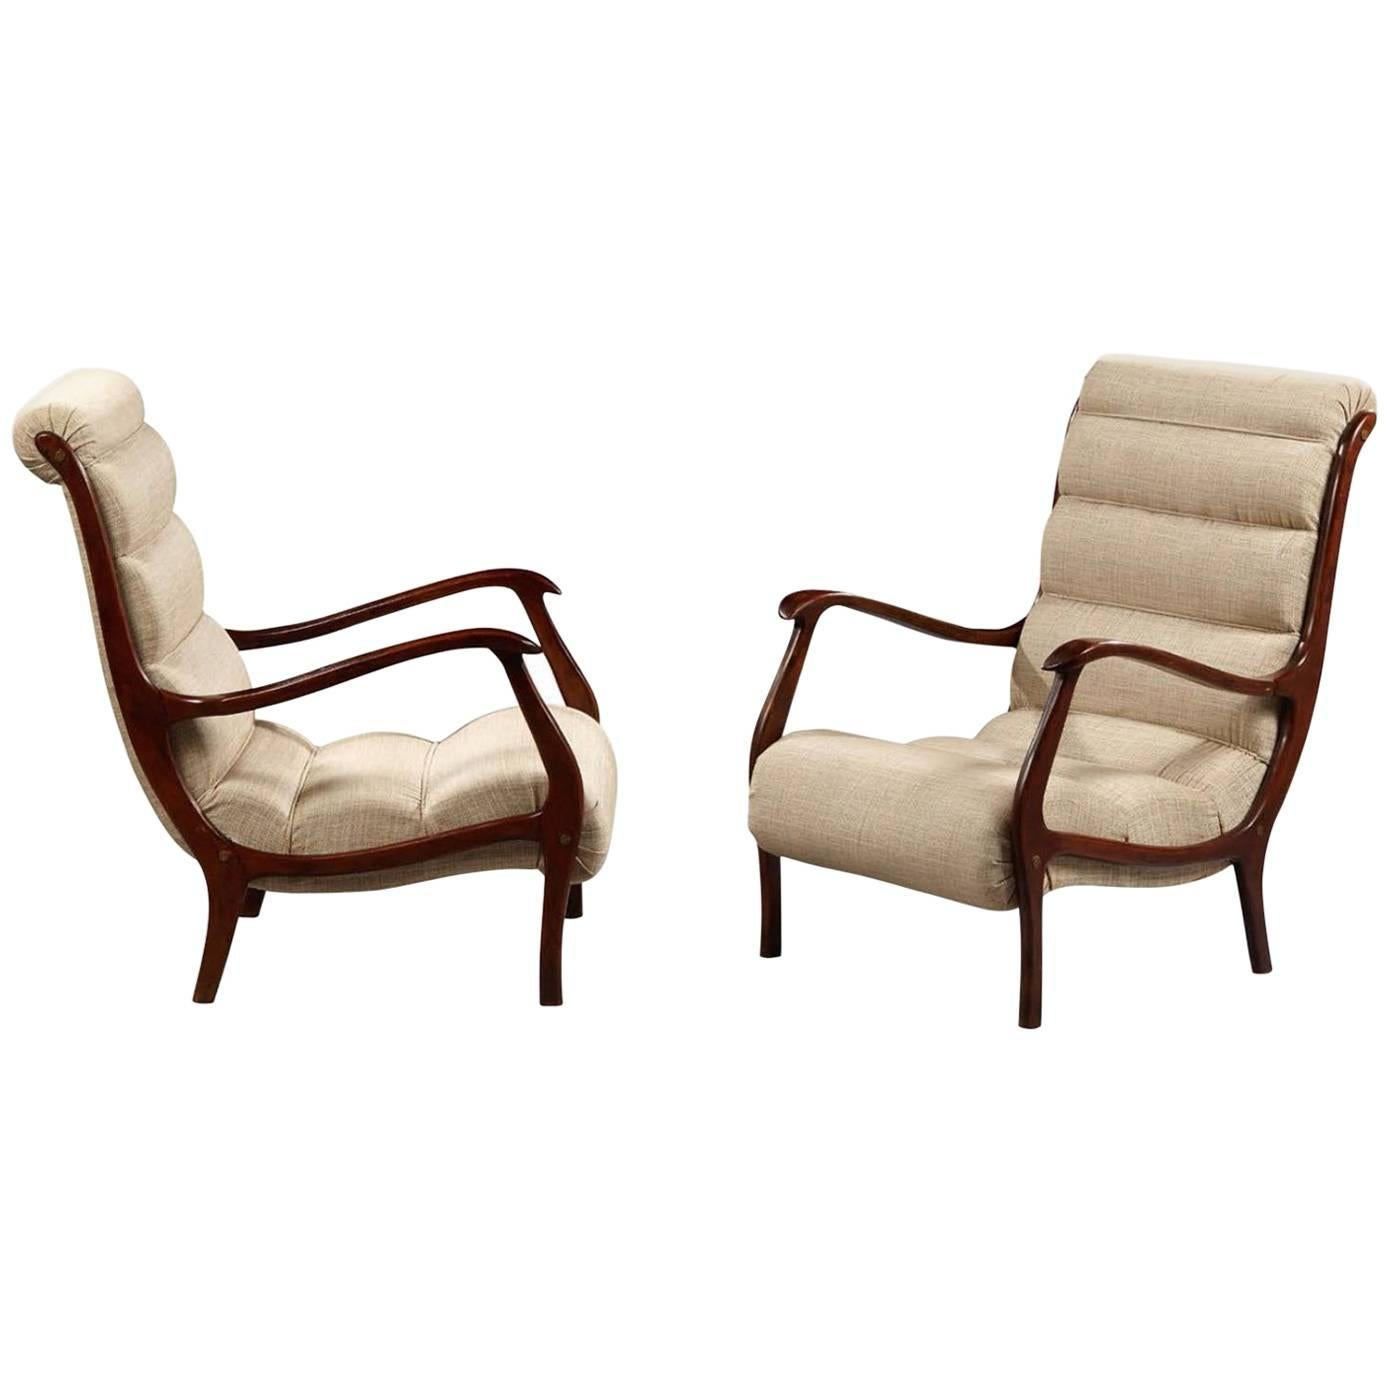 Pair of Mid-Century Armchairs, Italy, 1960s